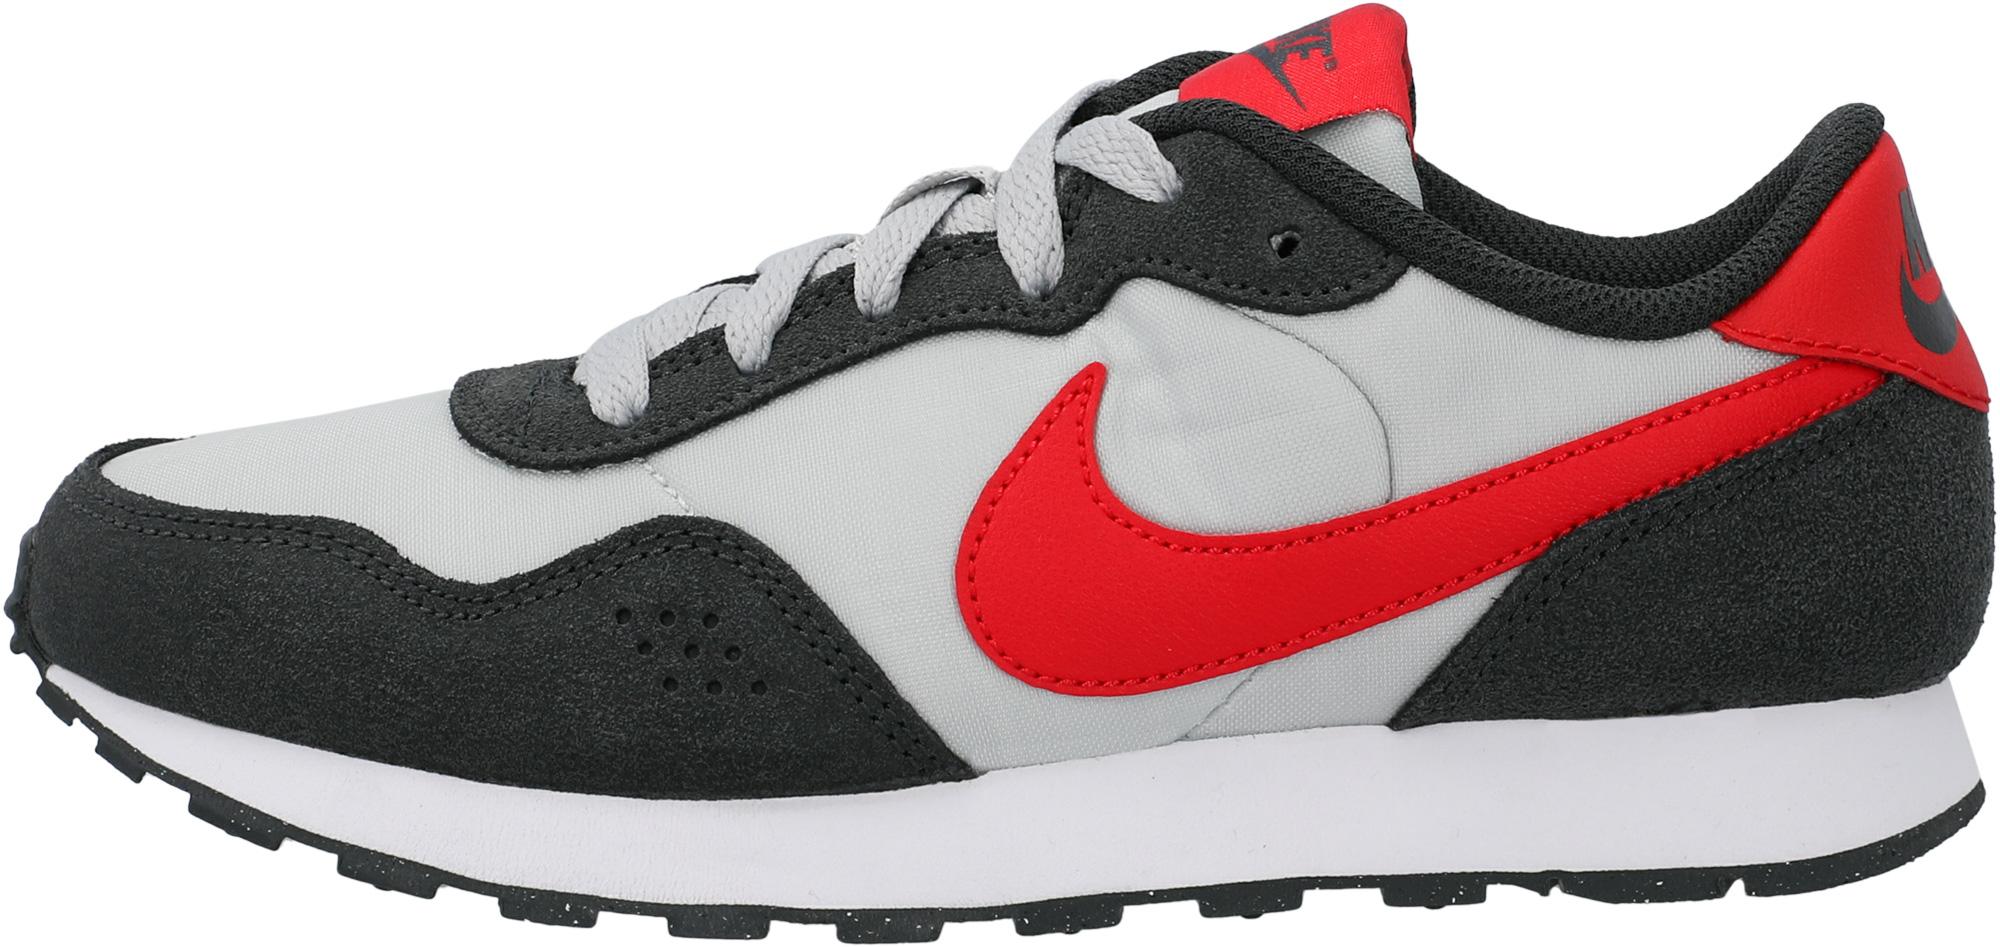 Nike Кроссовки для мальчиков Nike Md Valiant (GS), размер 35.5 кроссовки nike cortez basic ltr se gs shoe girls aa3043 001